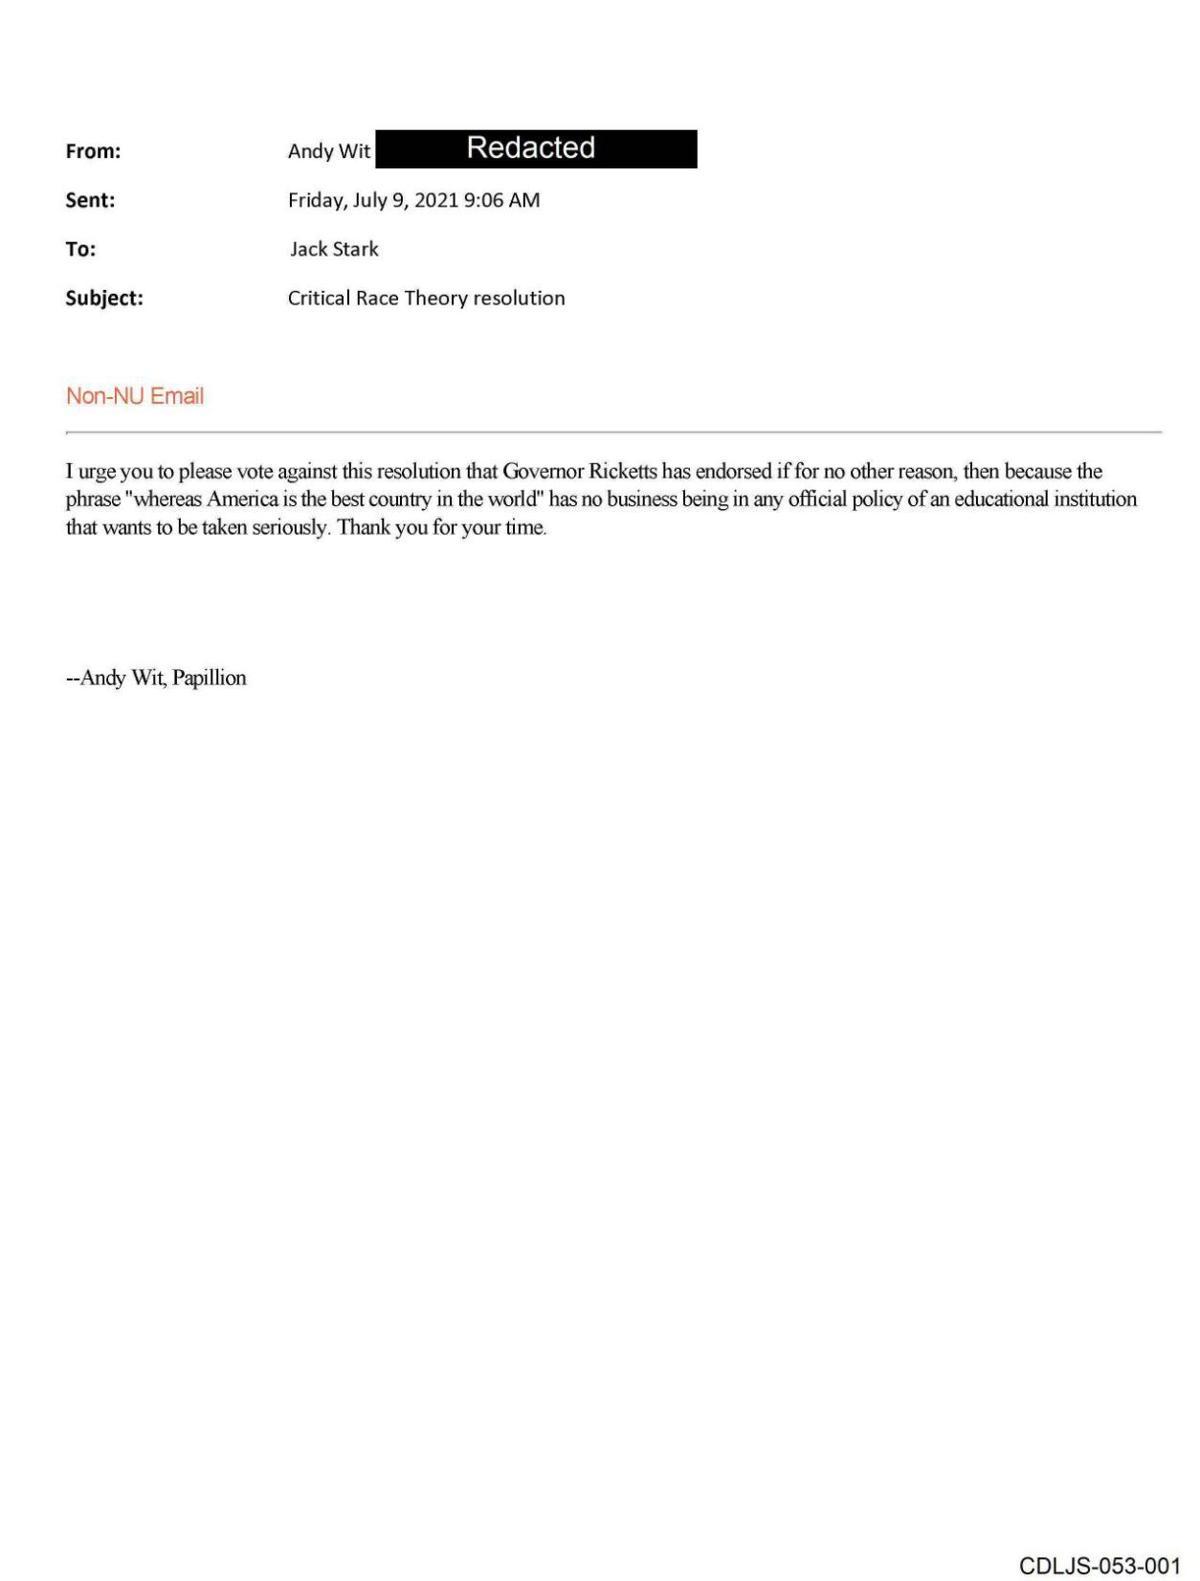 CDLJS-053-001.pdf